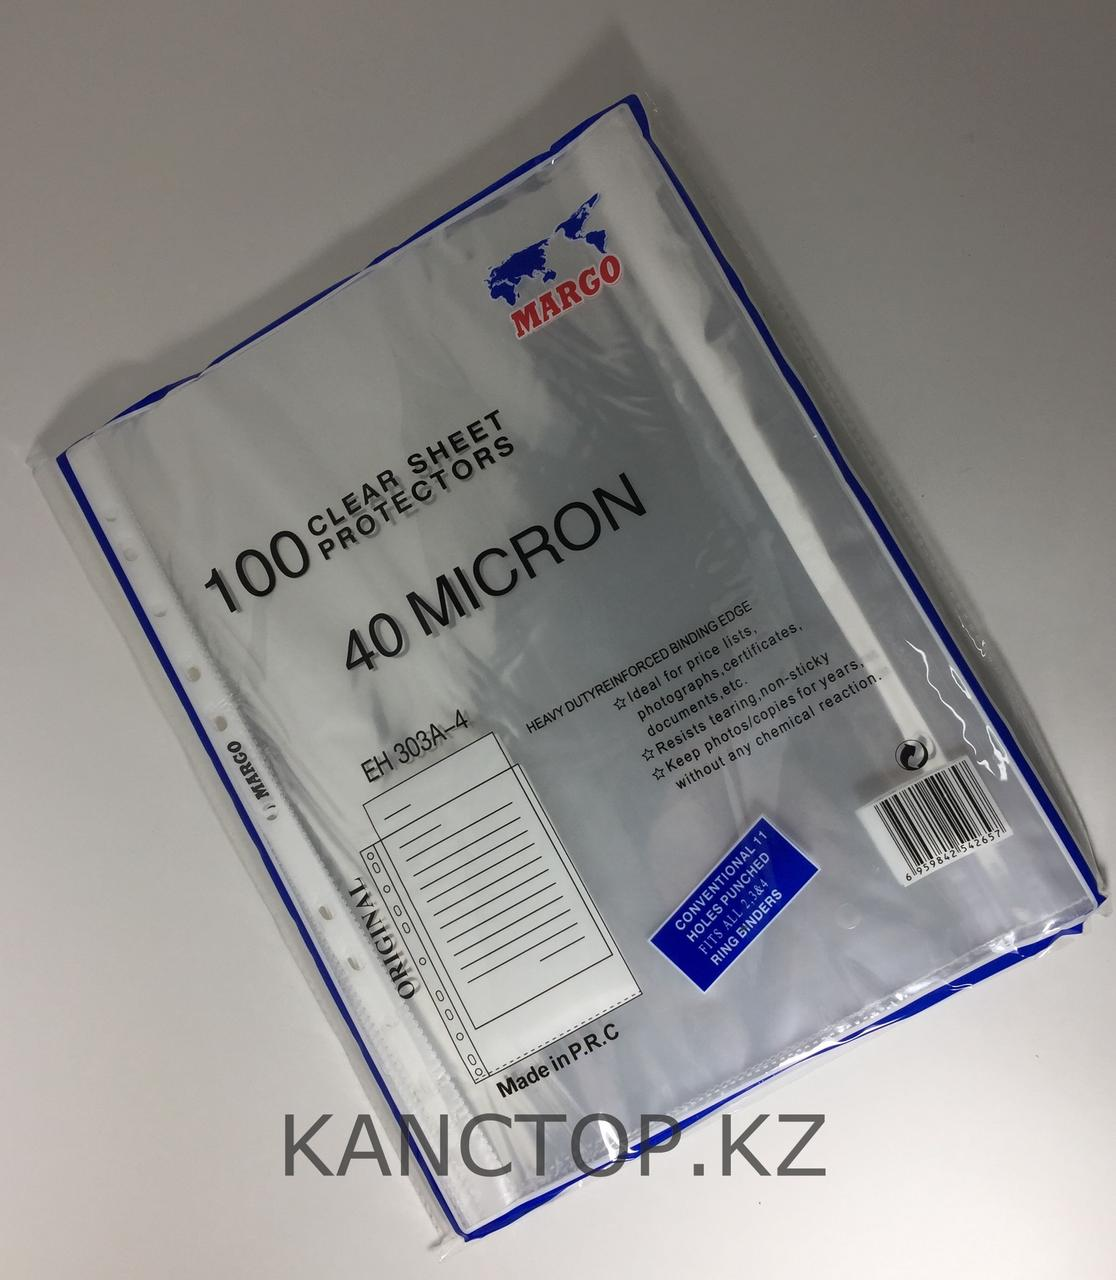 Файл - вкладыш А4 MARGO 40 мкр прозрачный